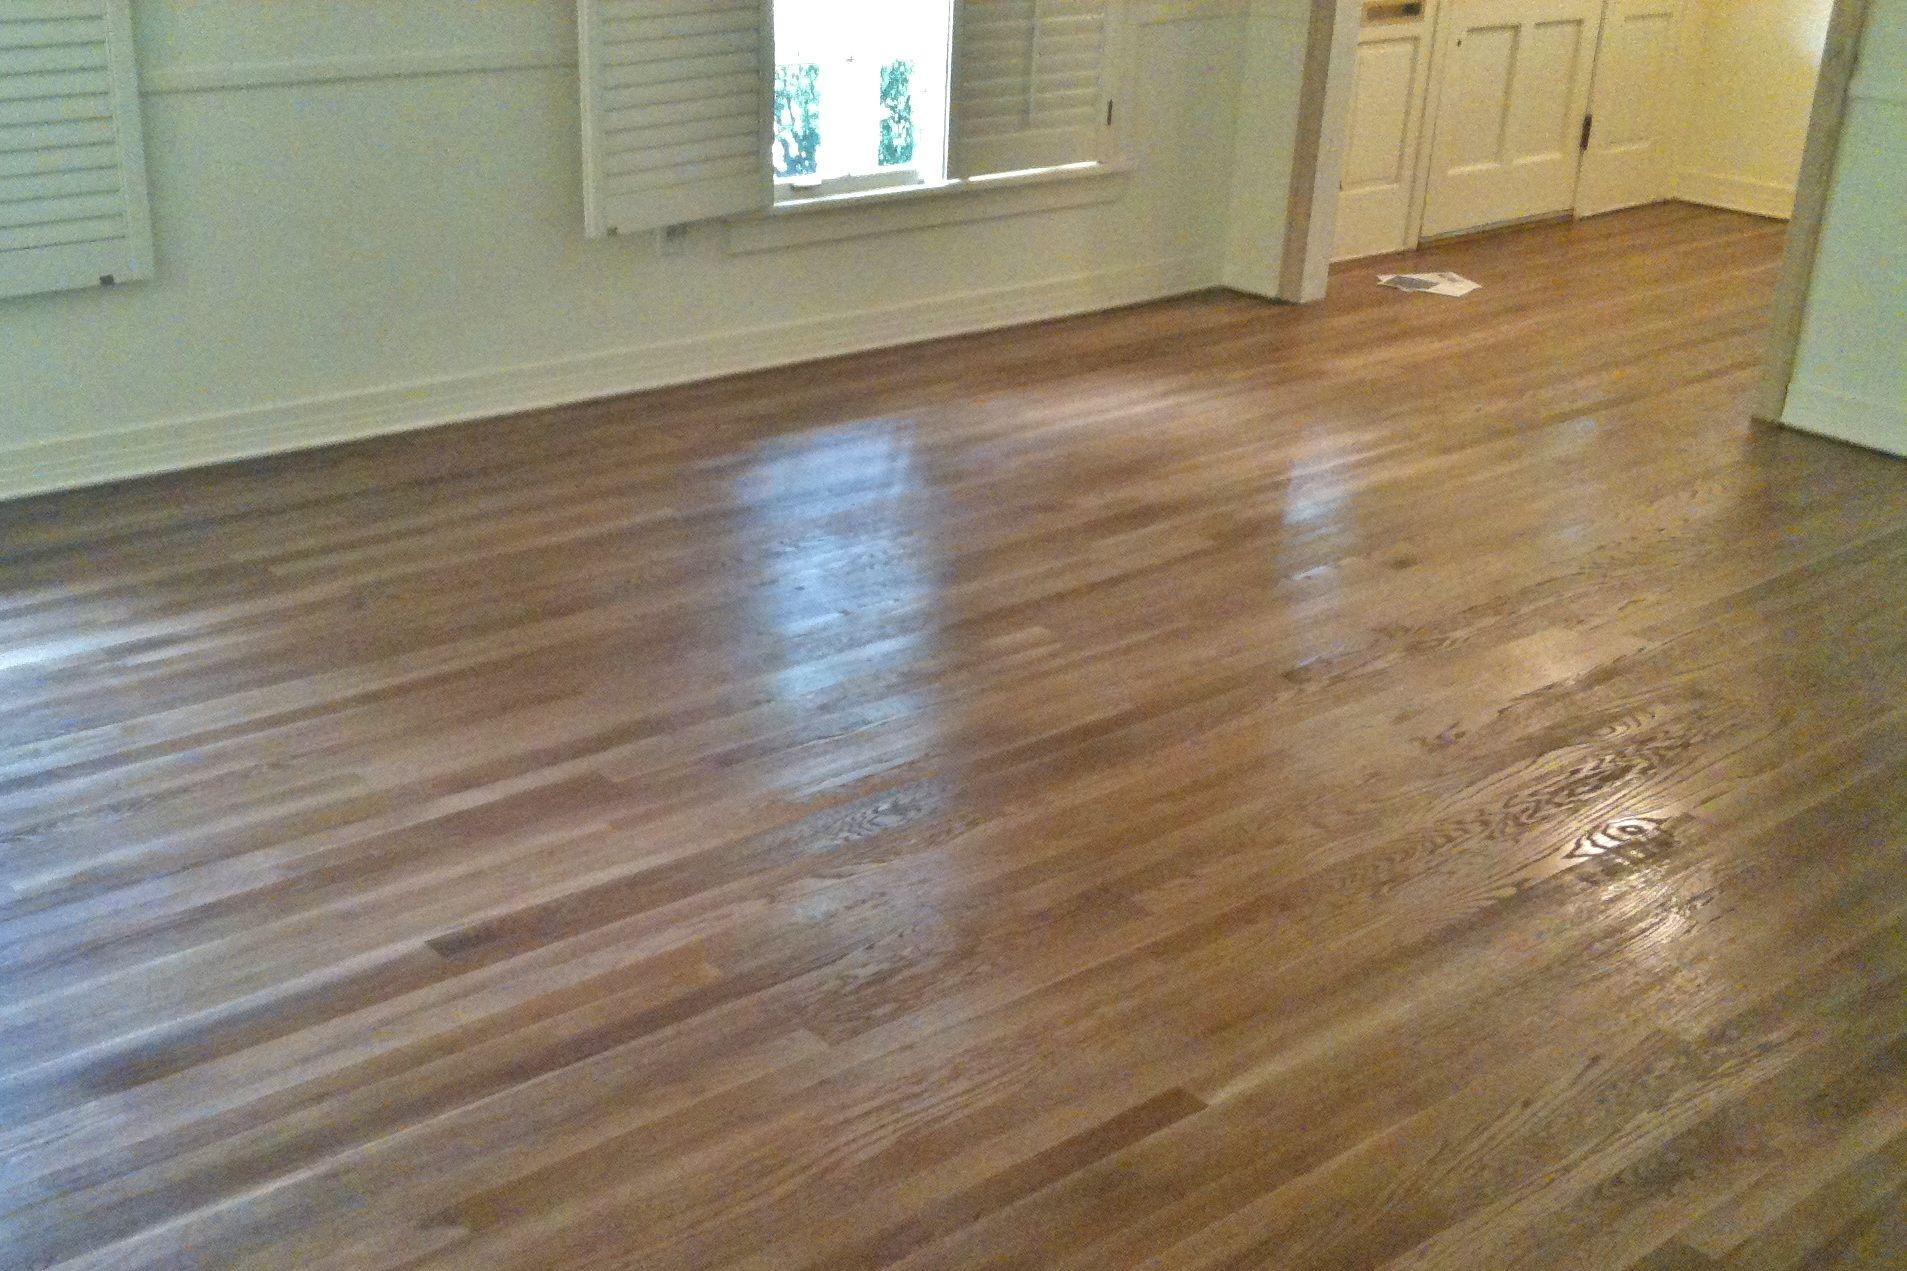 hardwood floor refinishing waukesha of oak meet special walnut home design pinterest flooring in minwax special walnut stain on oak hardwood floors walnut hardwood flooring refinishing hardwood